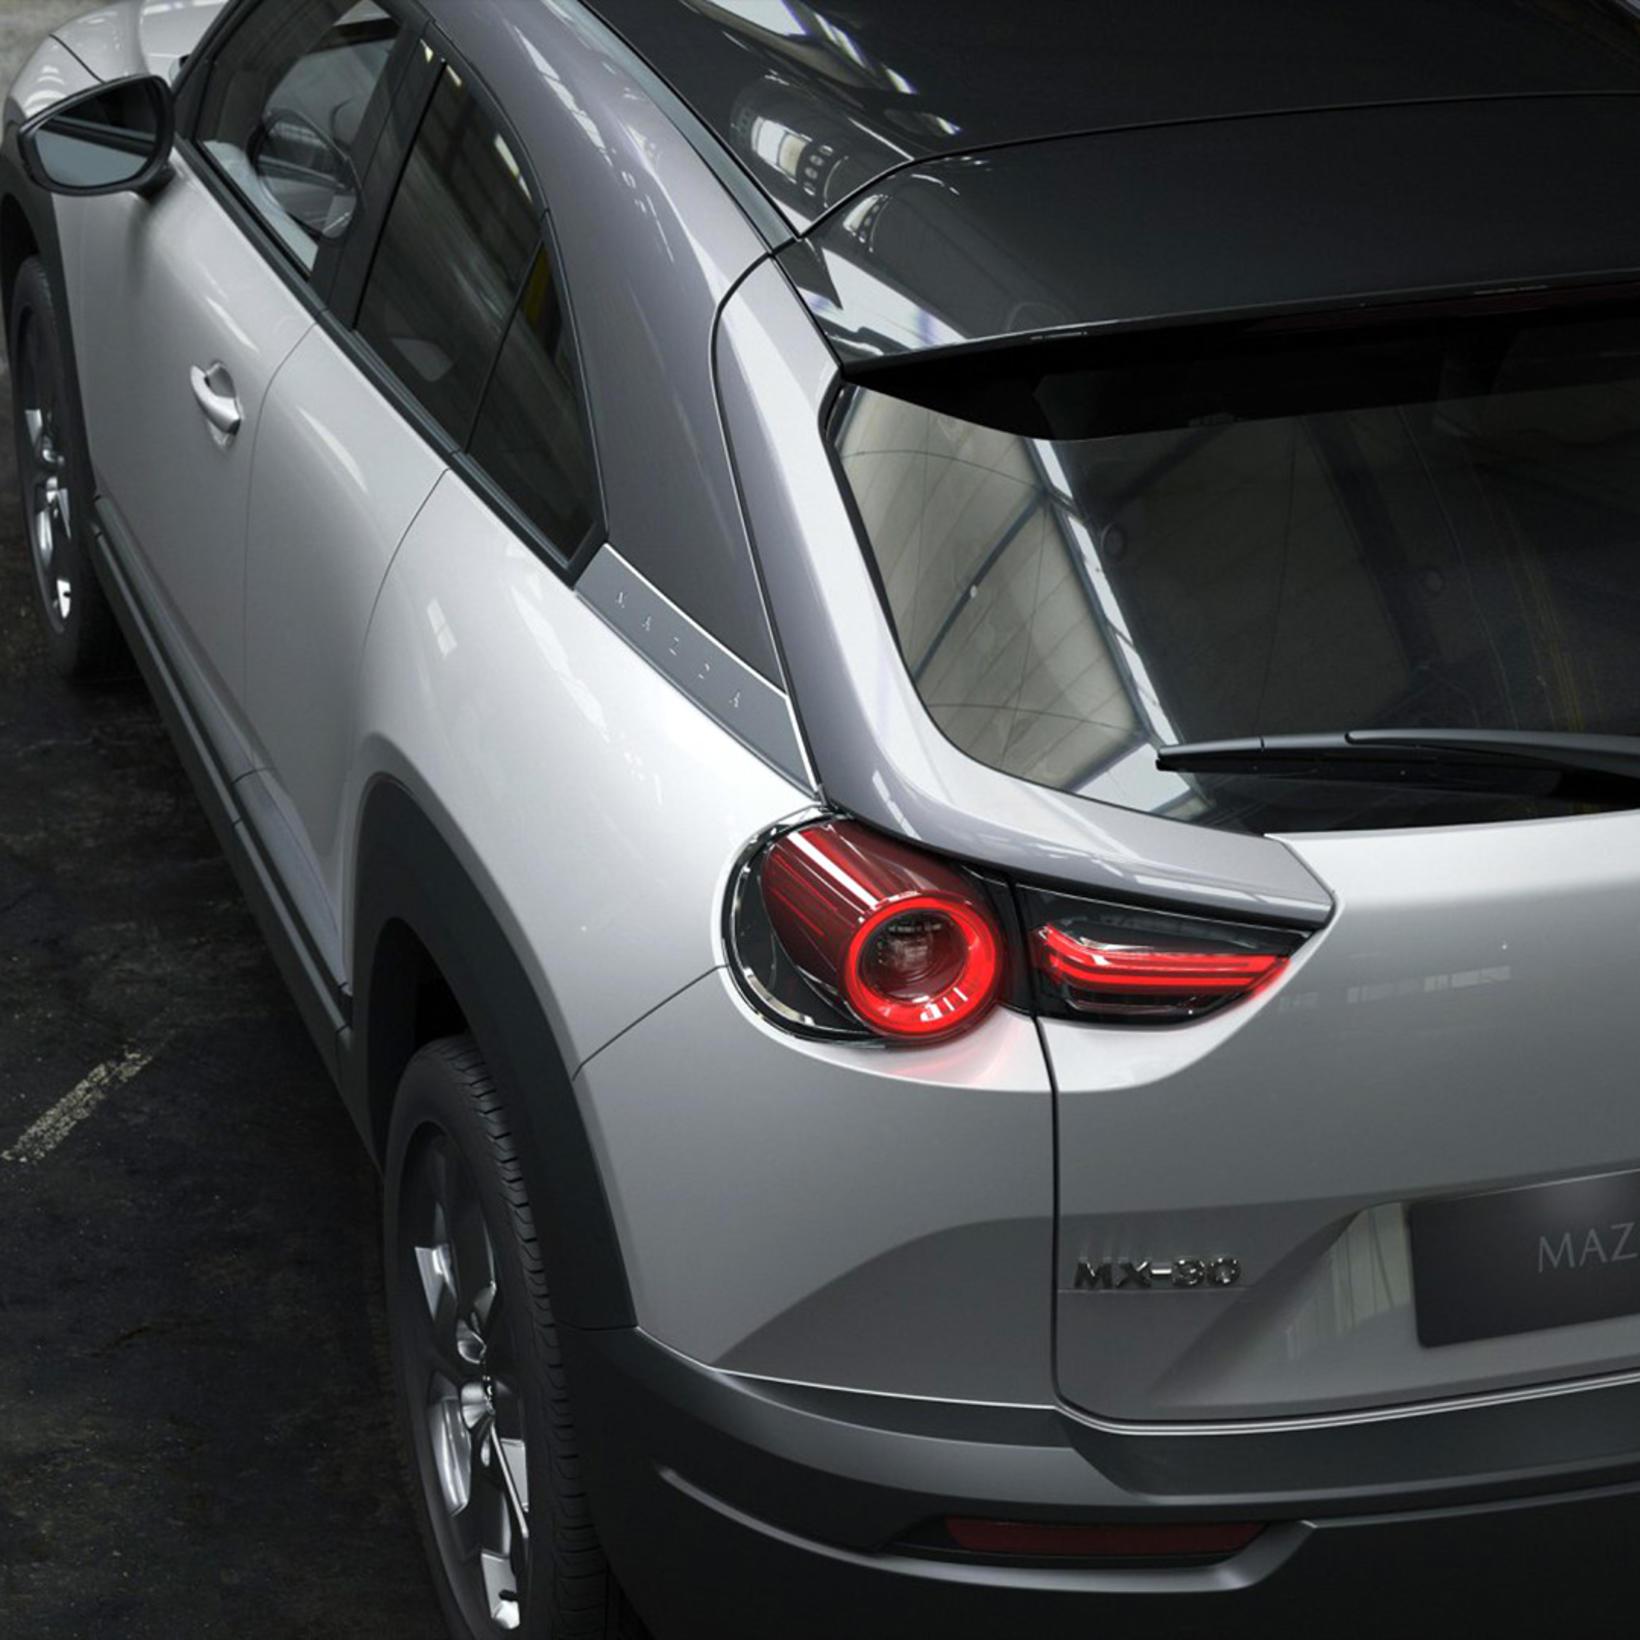 Mazda MX-30, nýi hreini rafbíllinn frá Mazda.